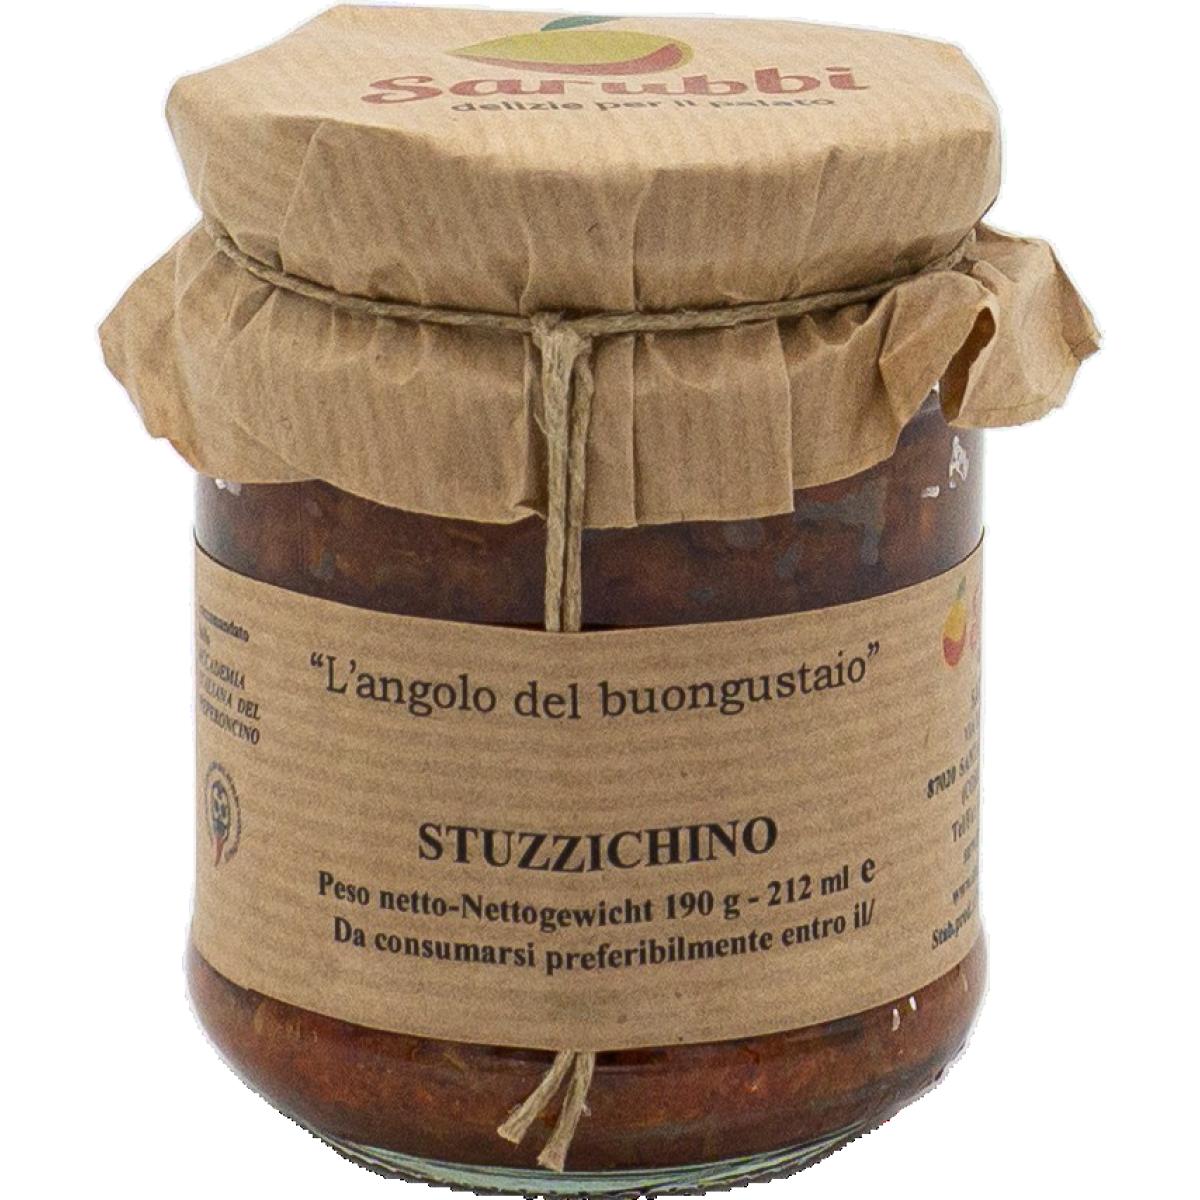 Paste Stuzzichino, PIK 2